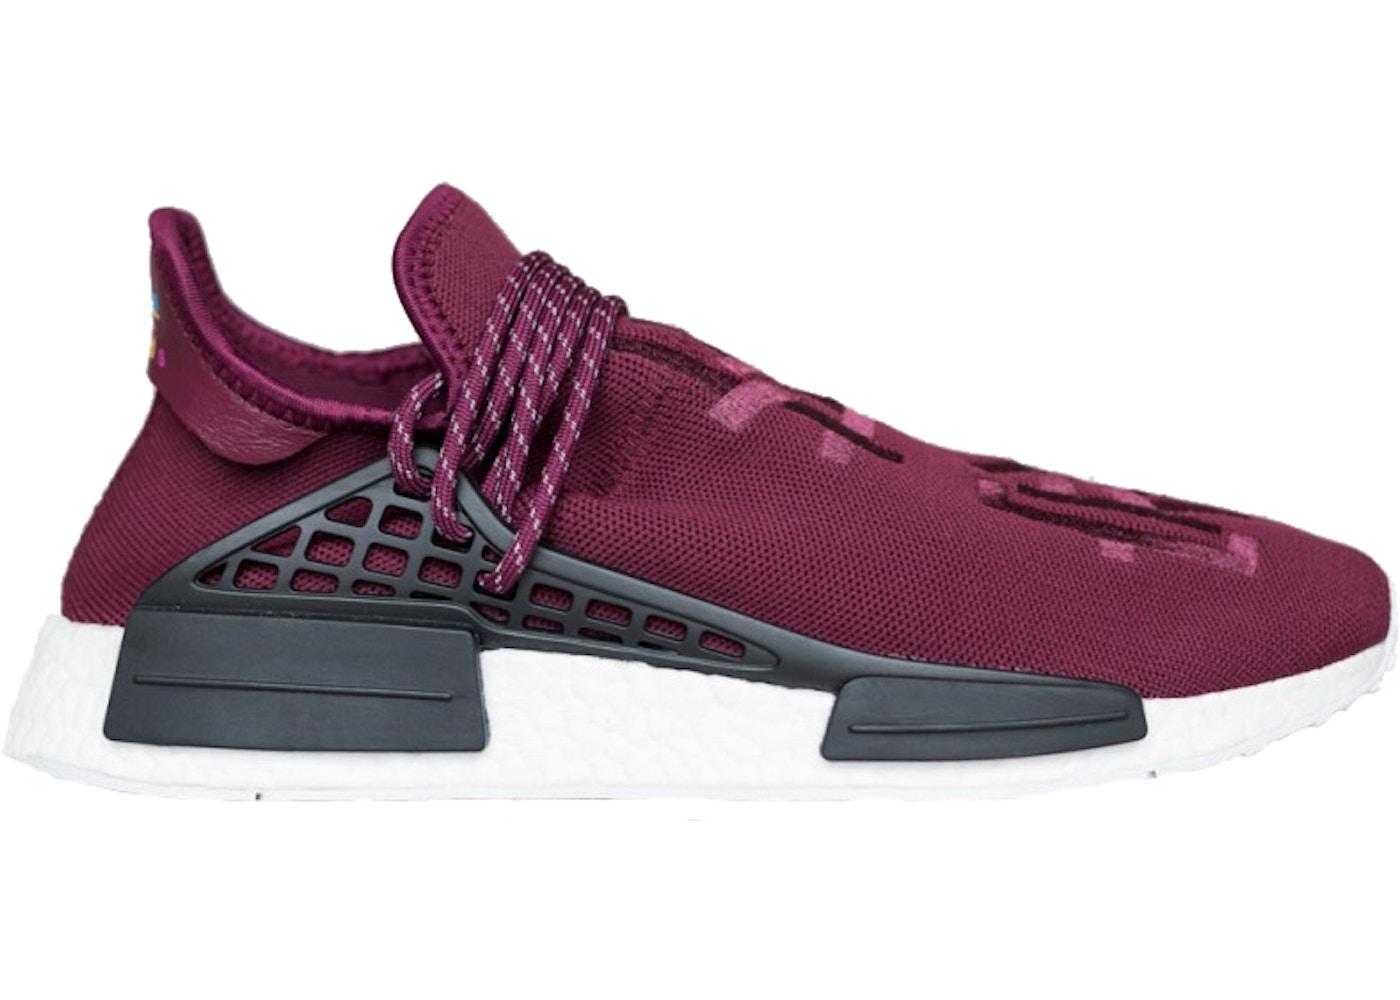 Buy Deadstock Sneakers Adidas Shoesamp; Nmd SqVjLGUzpM